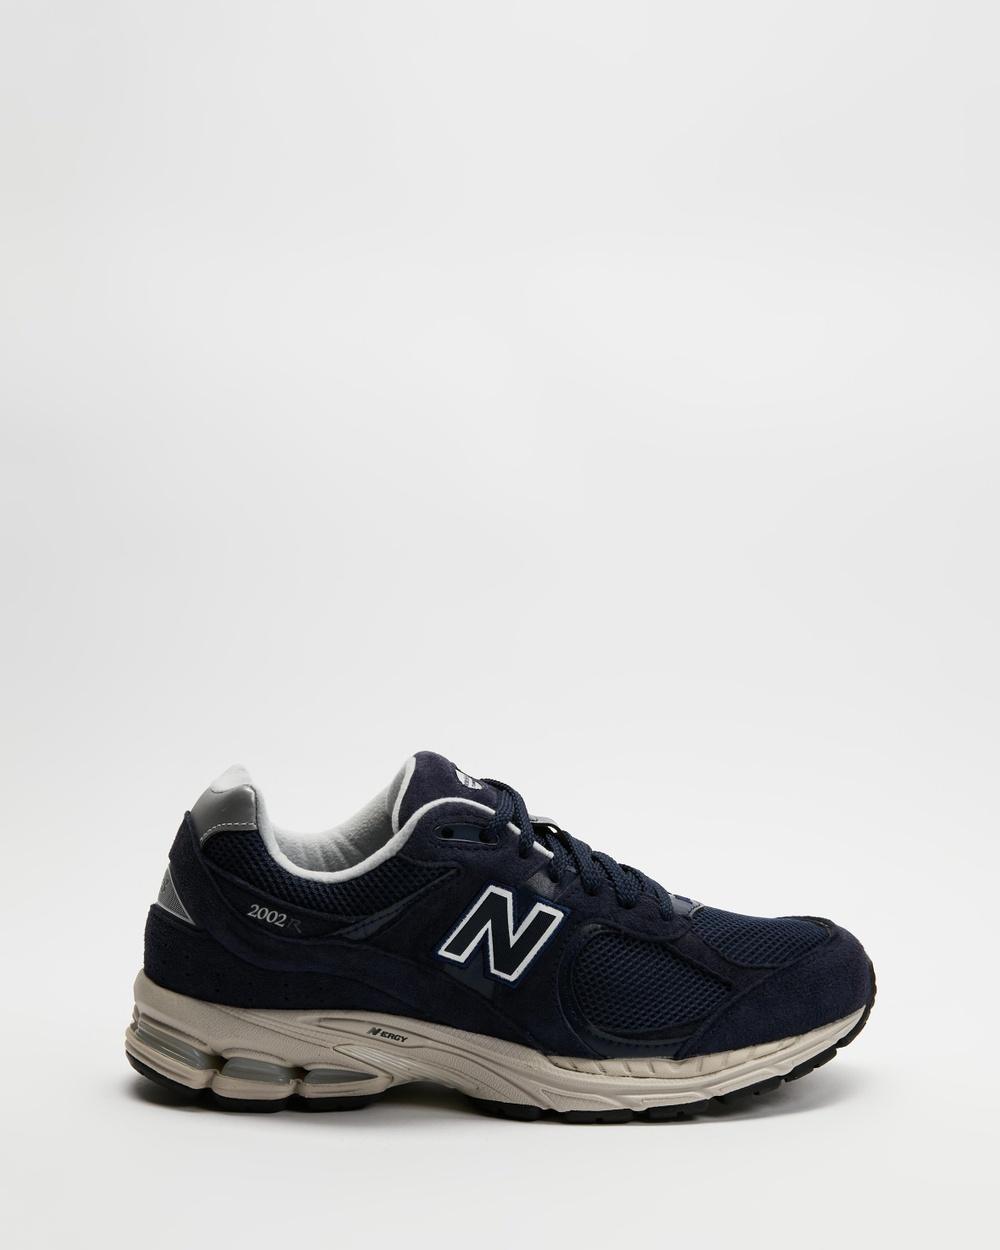 New Balance Classics ML2002RD Men's Lifestyle Sneakers Navy